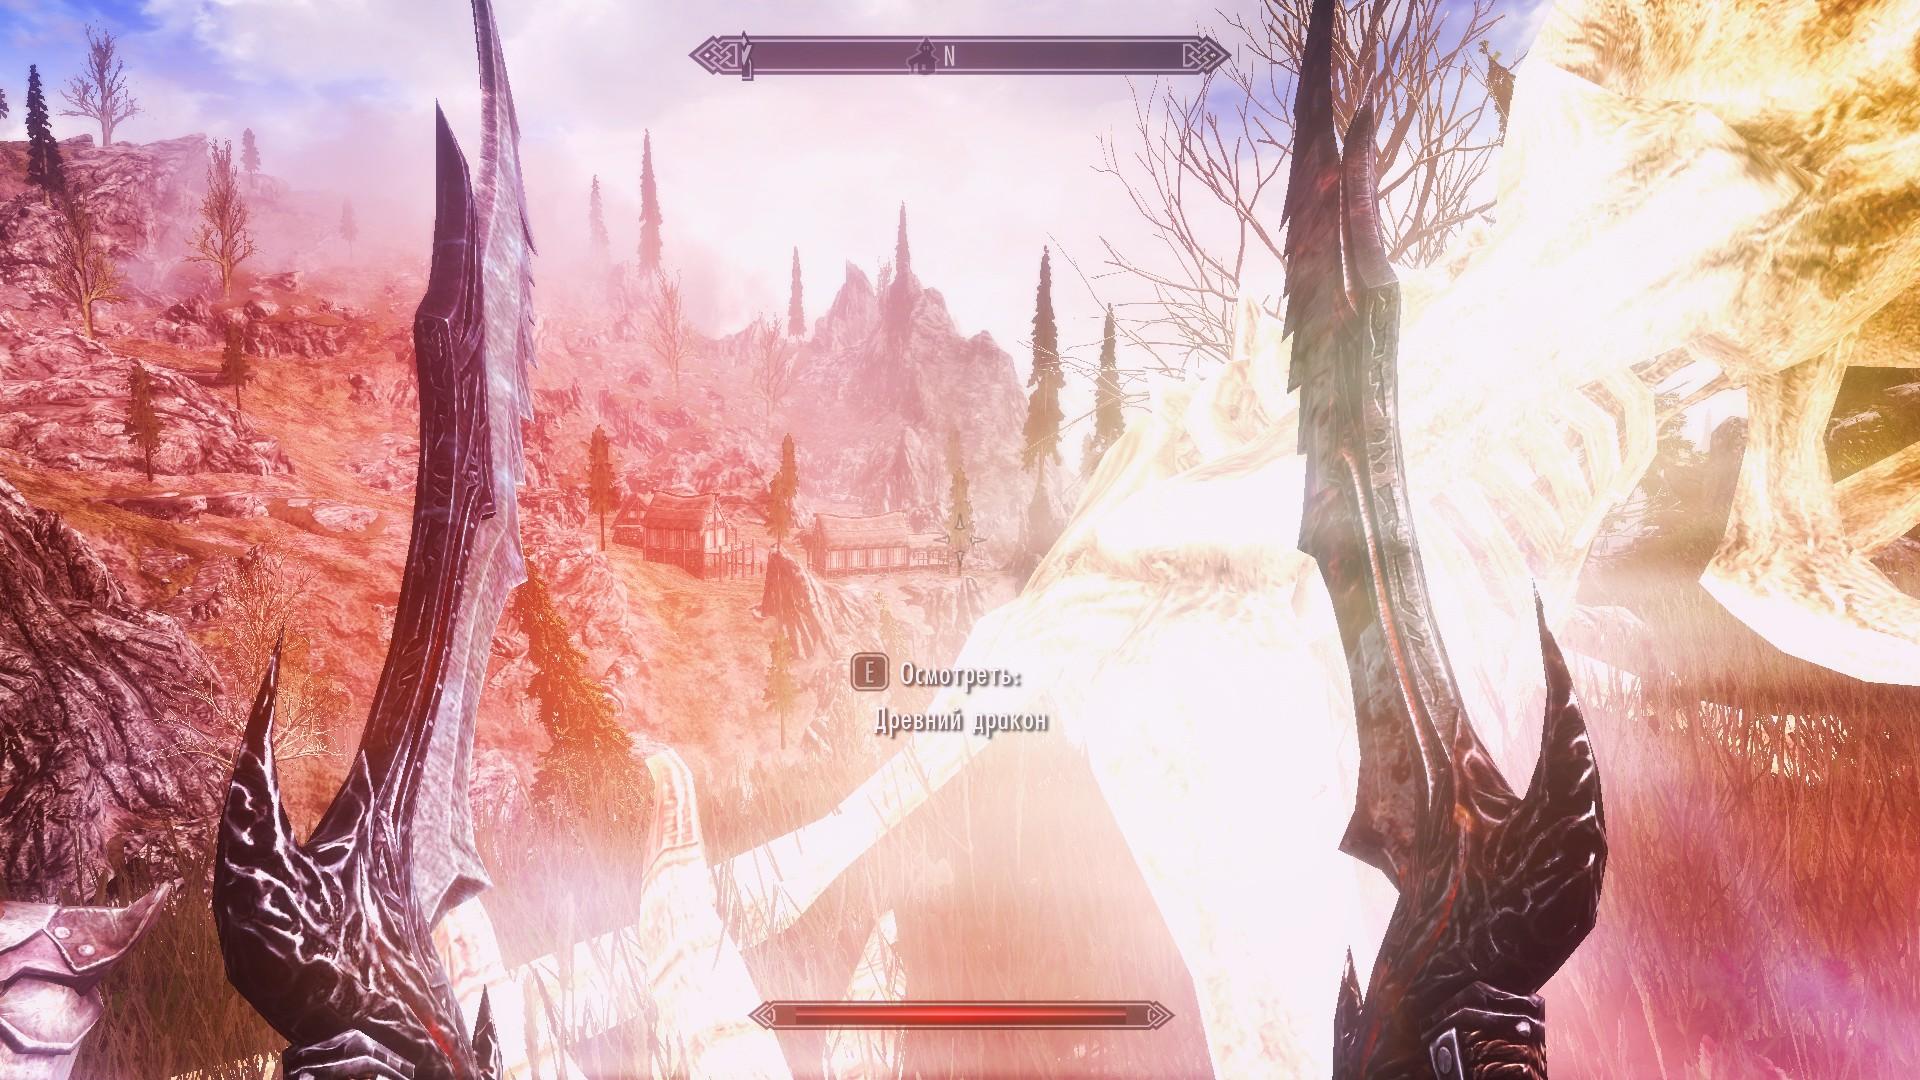 20180314200125_1.jpg - Elder Scrolls 5: Skyrim, the